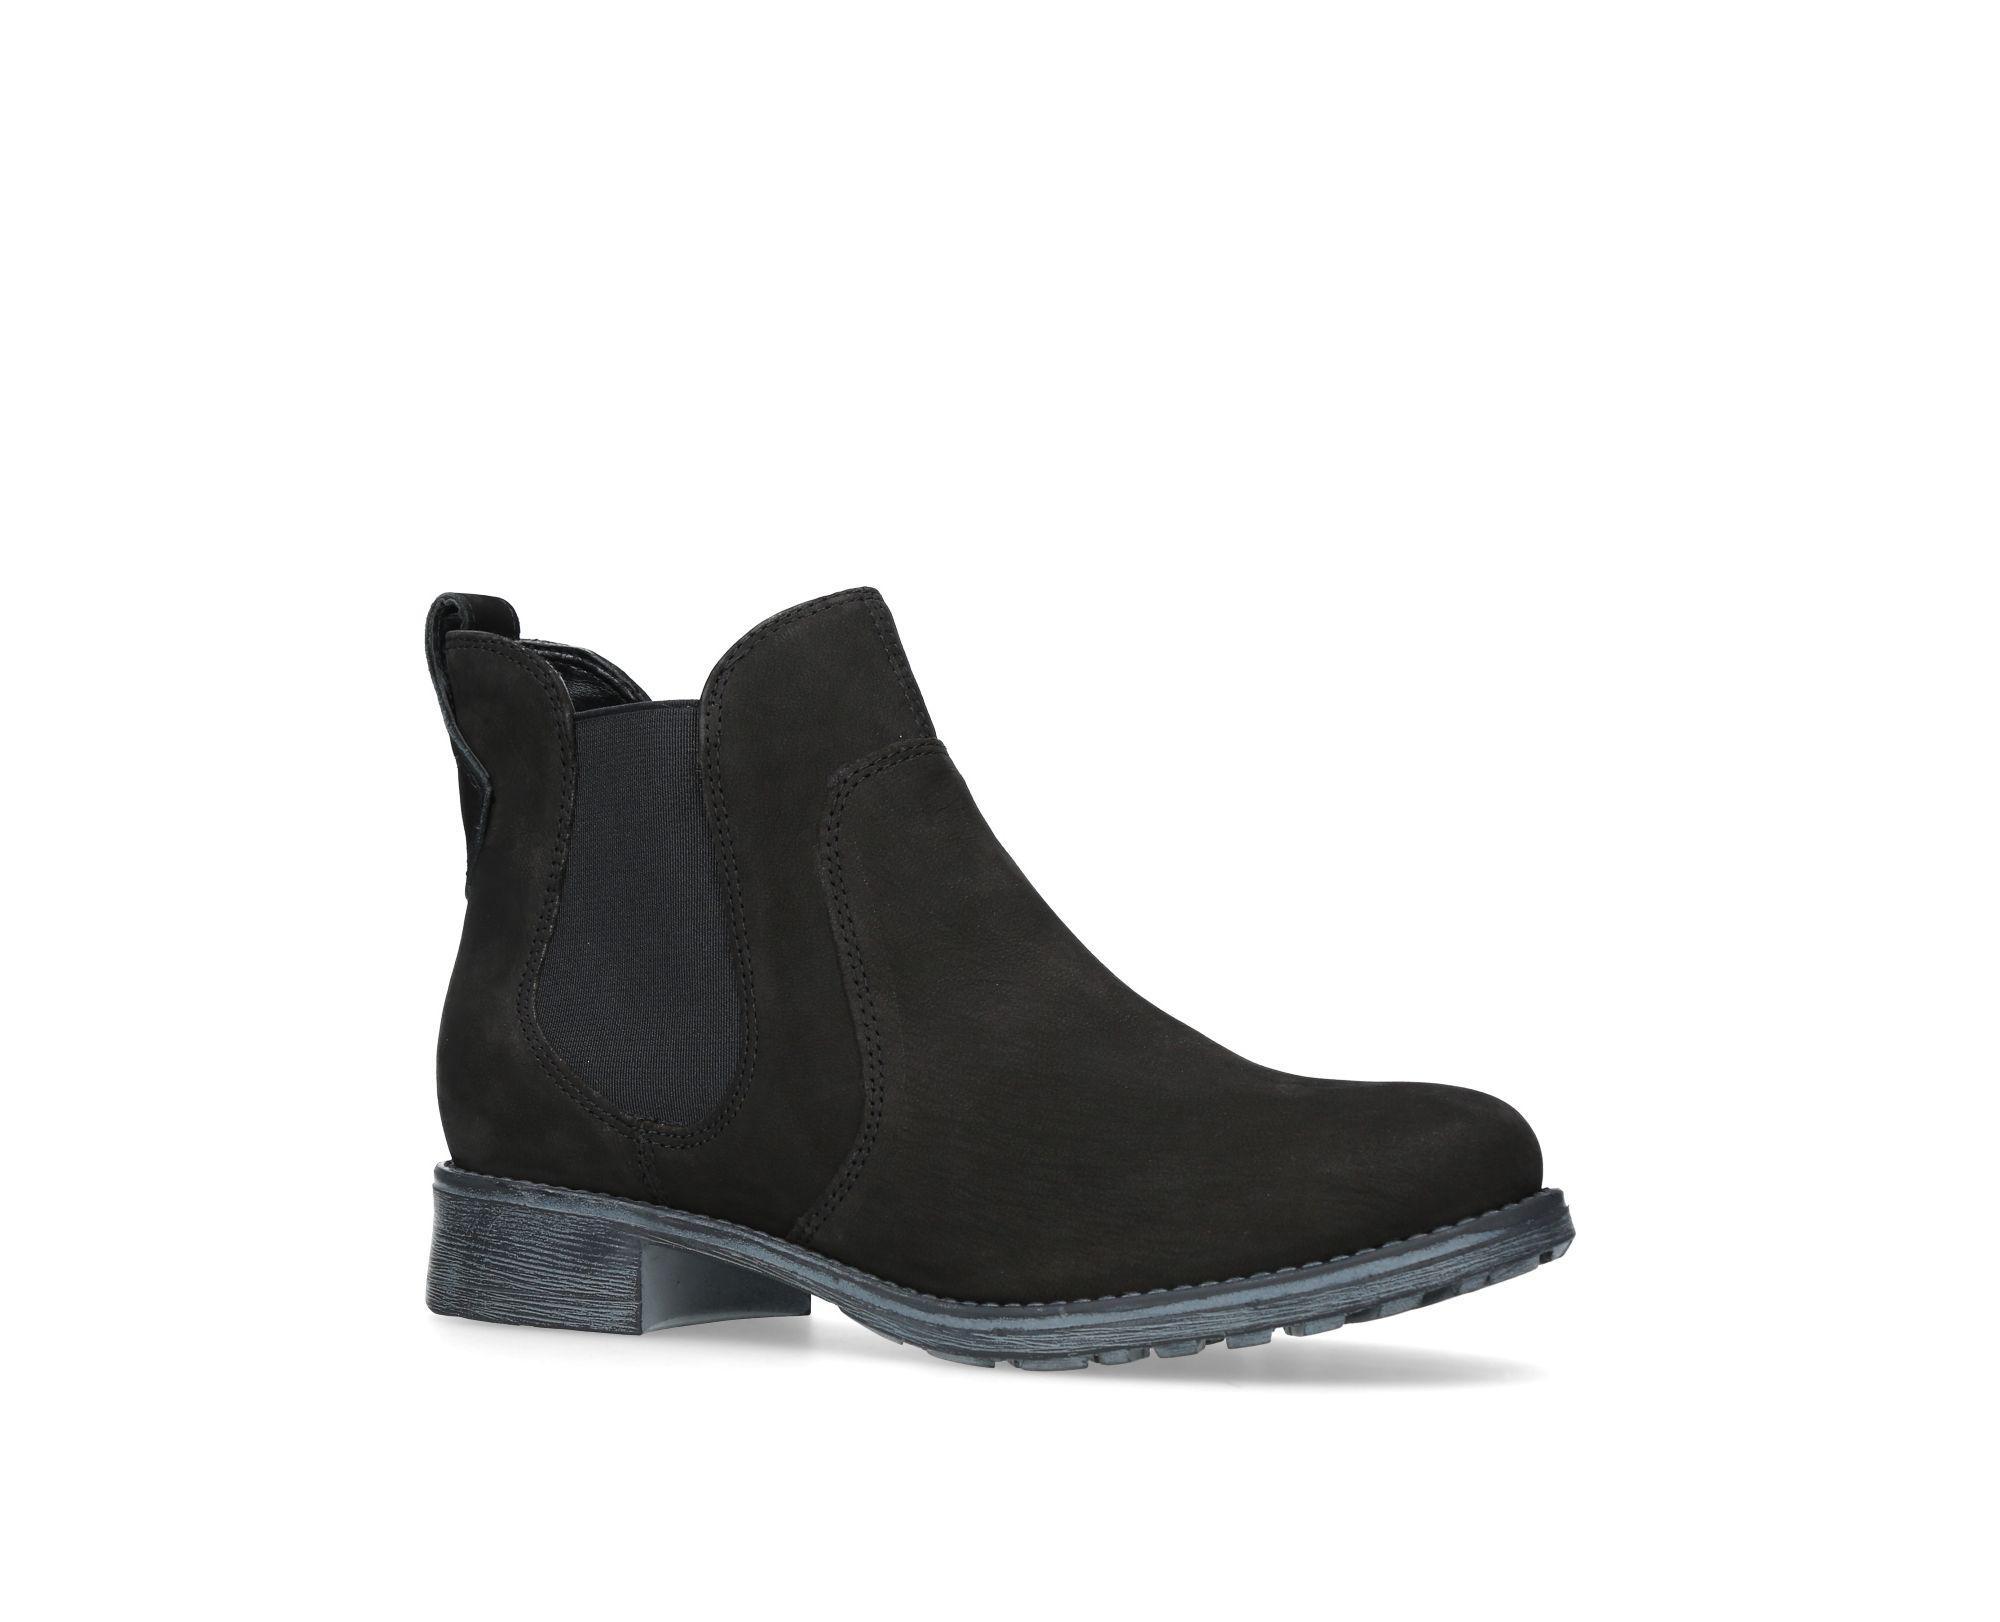 Carvela Kurt Geiger. Women's Black Solid Flat Ankle Boots